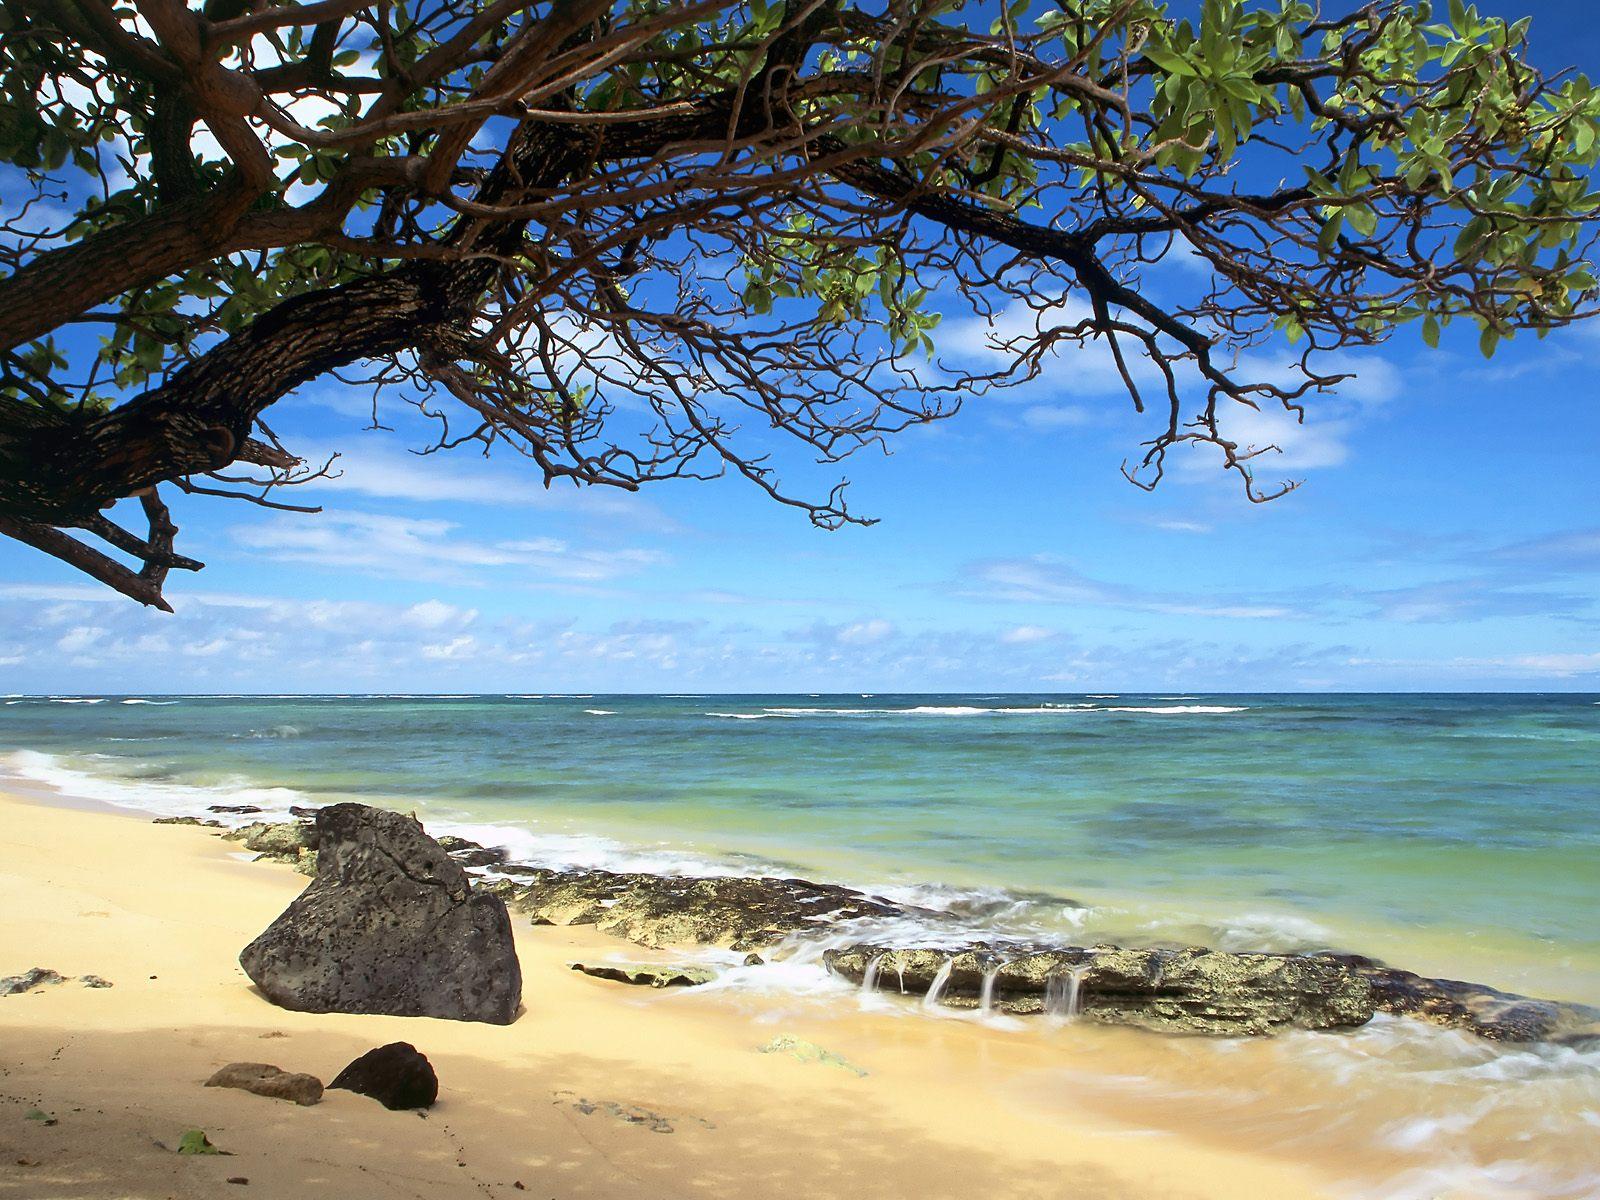 Kanenelu Beach Oahu Hawaii - Nature Wallpaper Image featuring Beaches ...